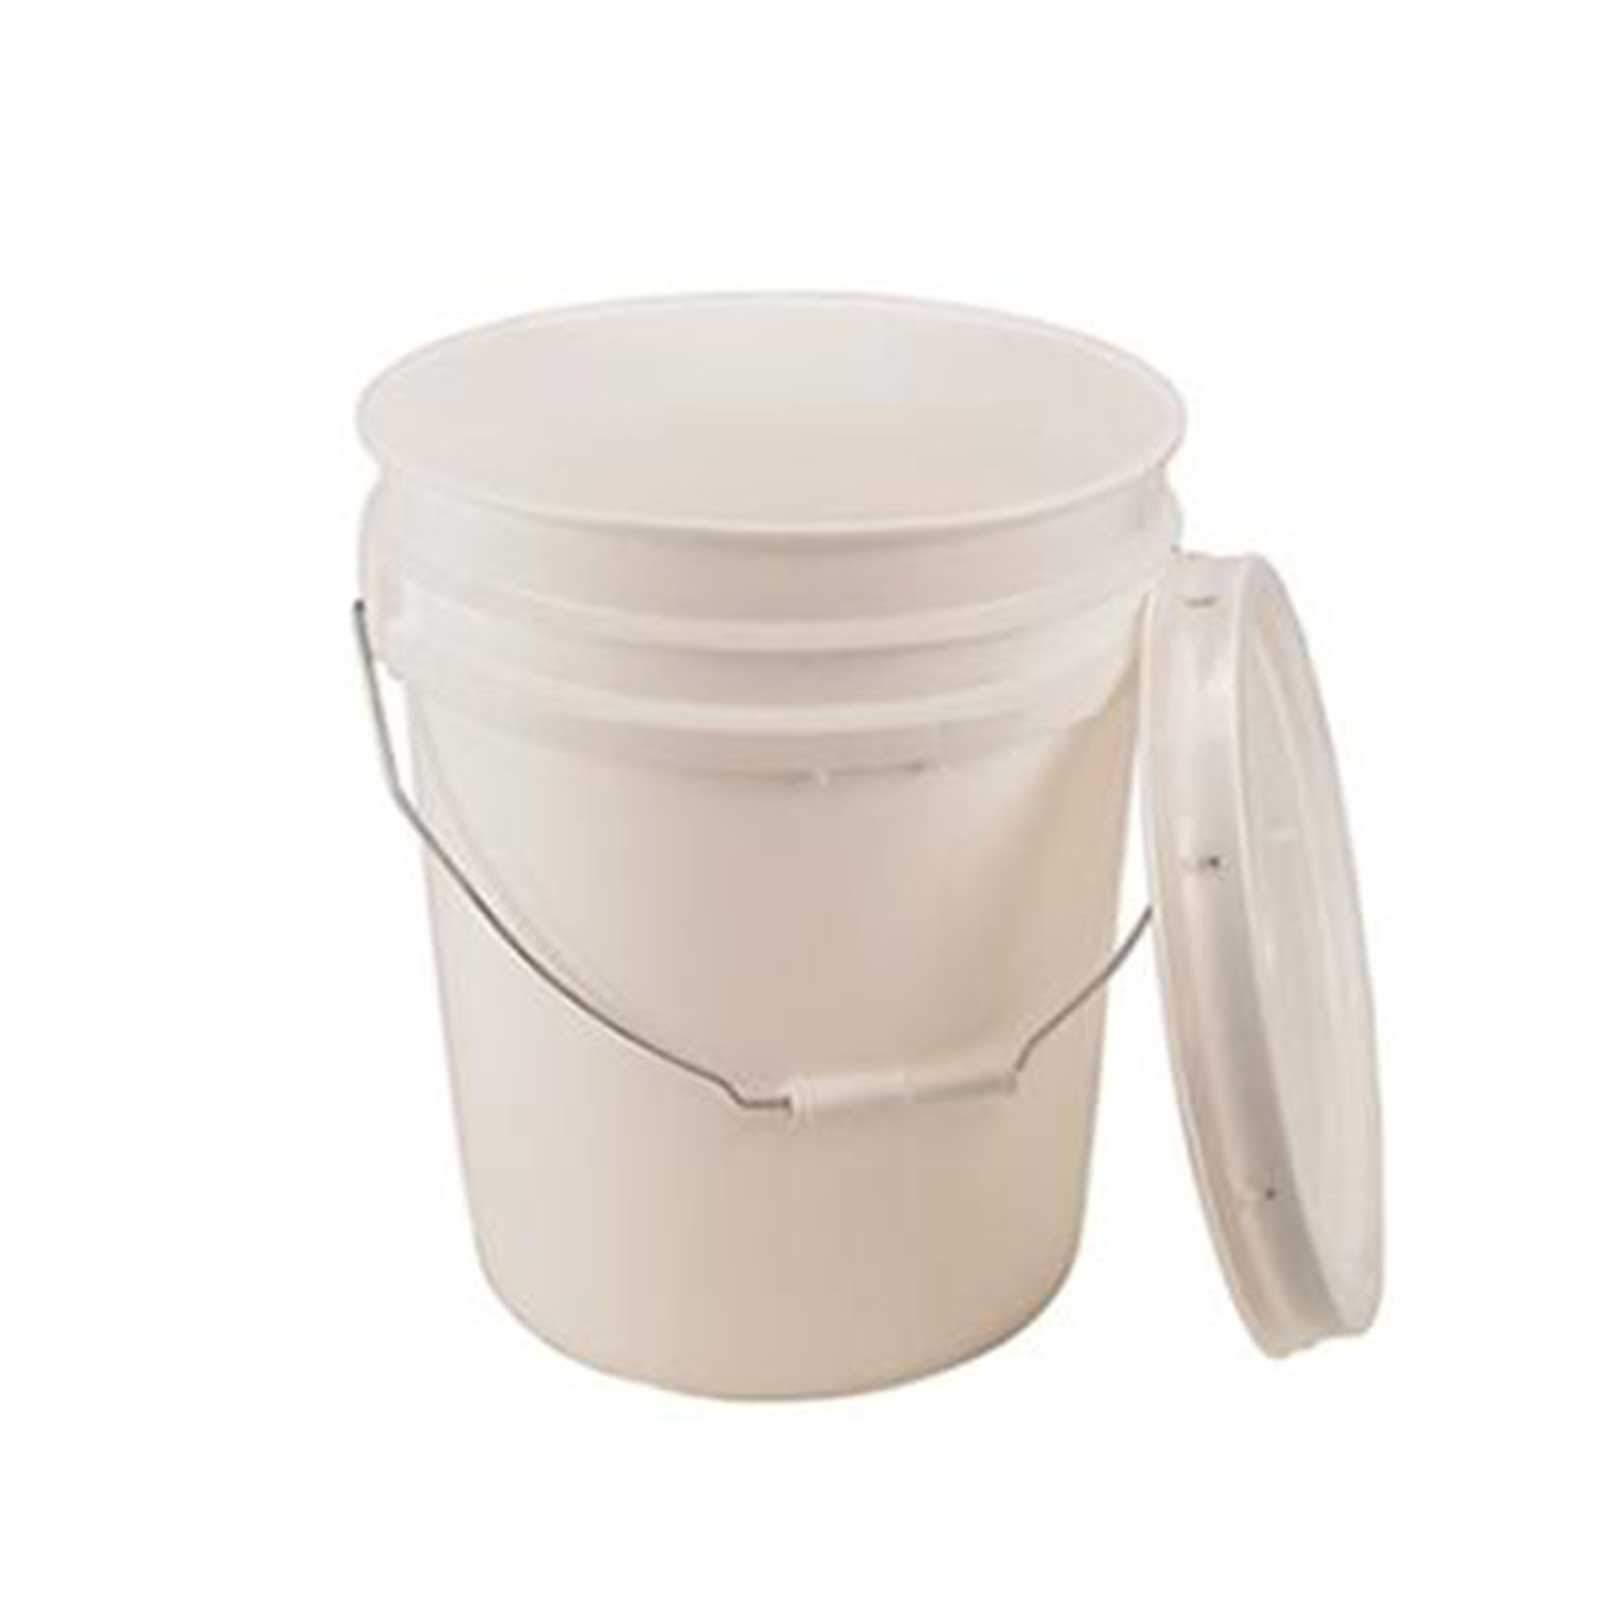 5 Gallon White Bucket & Lid